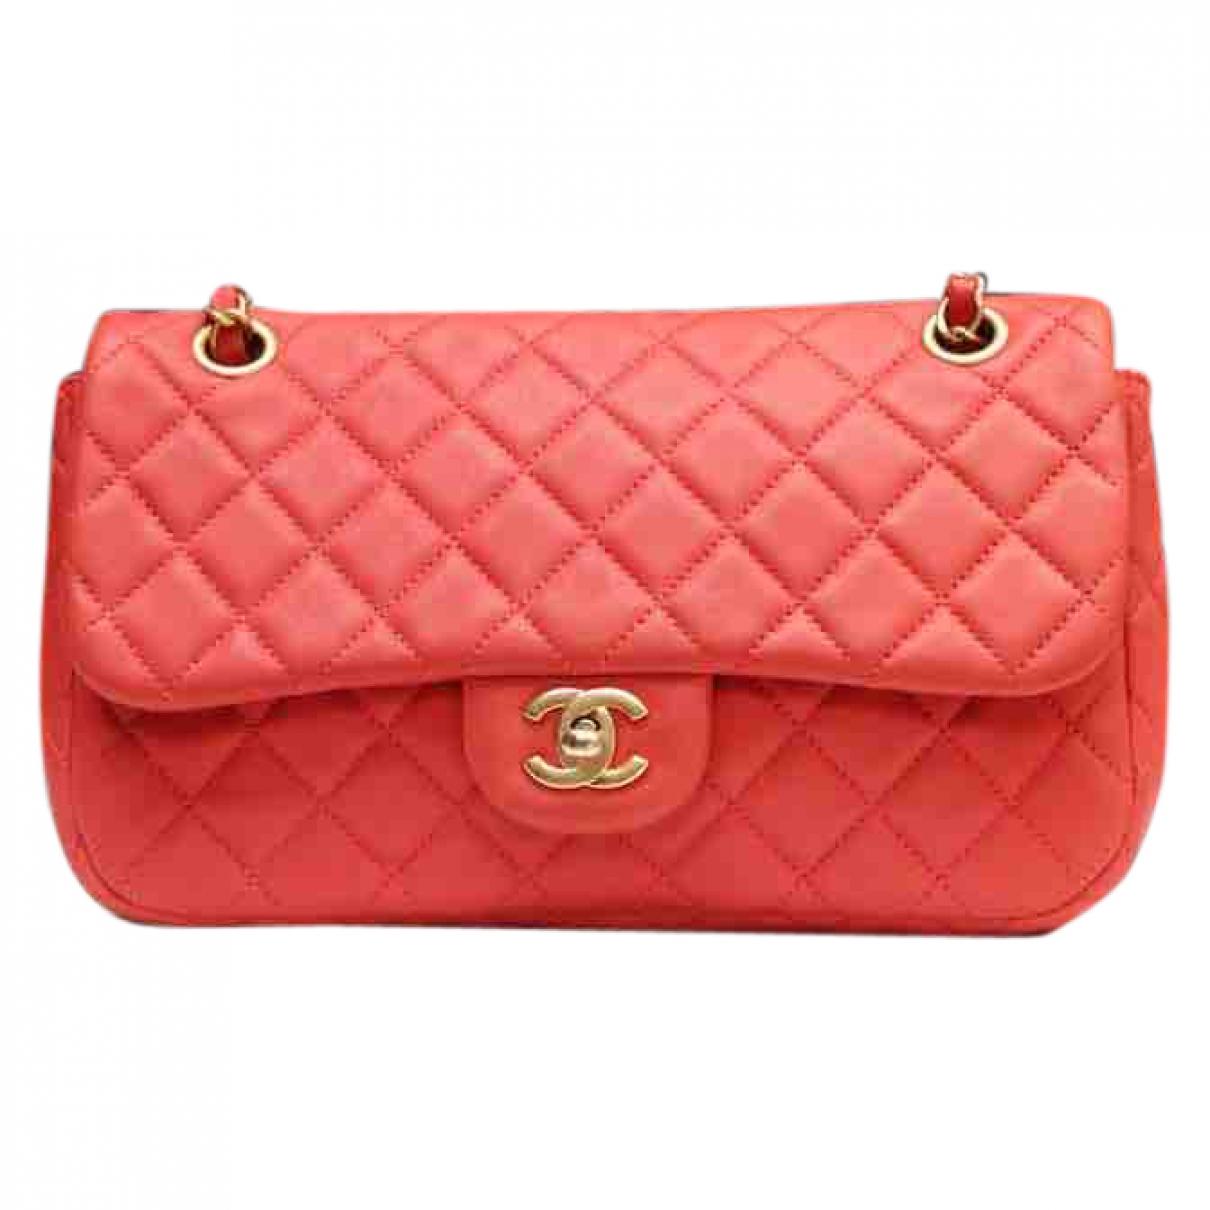 Chanel Timeless/Classique Orange Leather handbag for Women \N